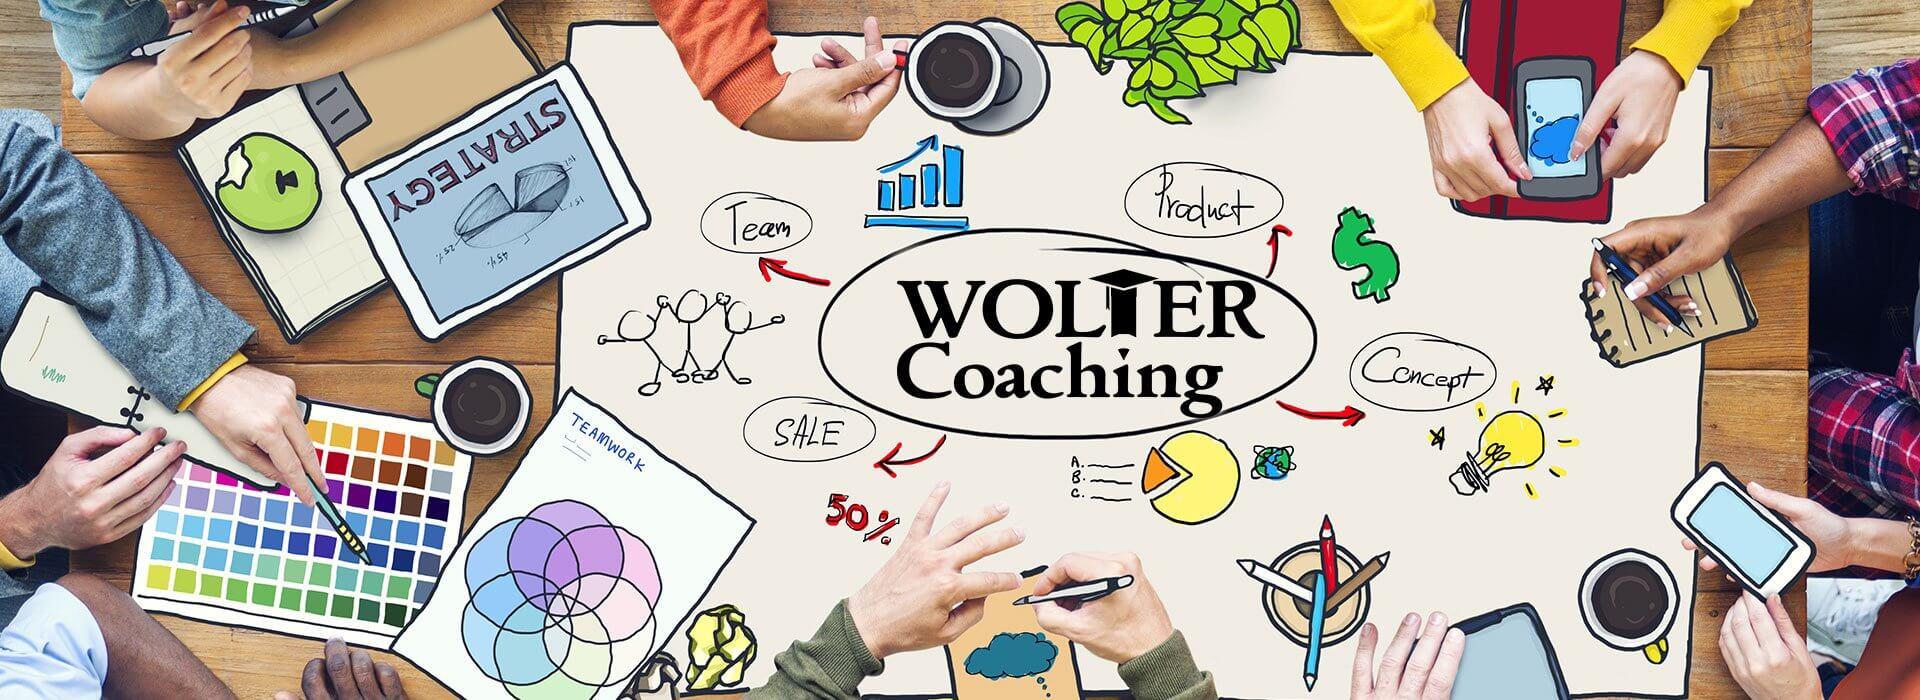 Bild Meeting | Wolter Coaching